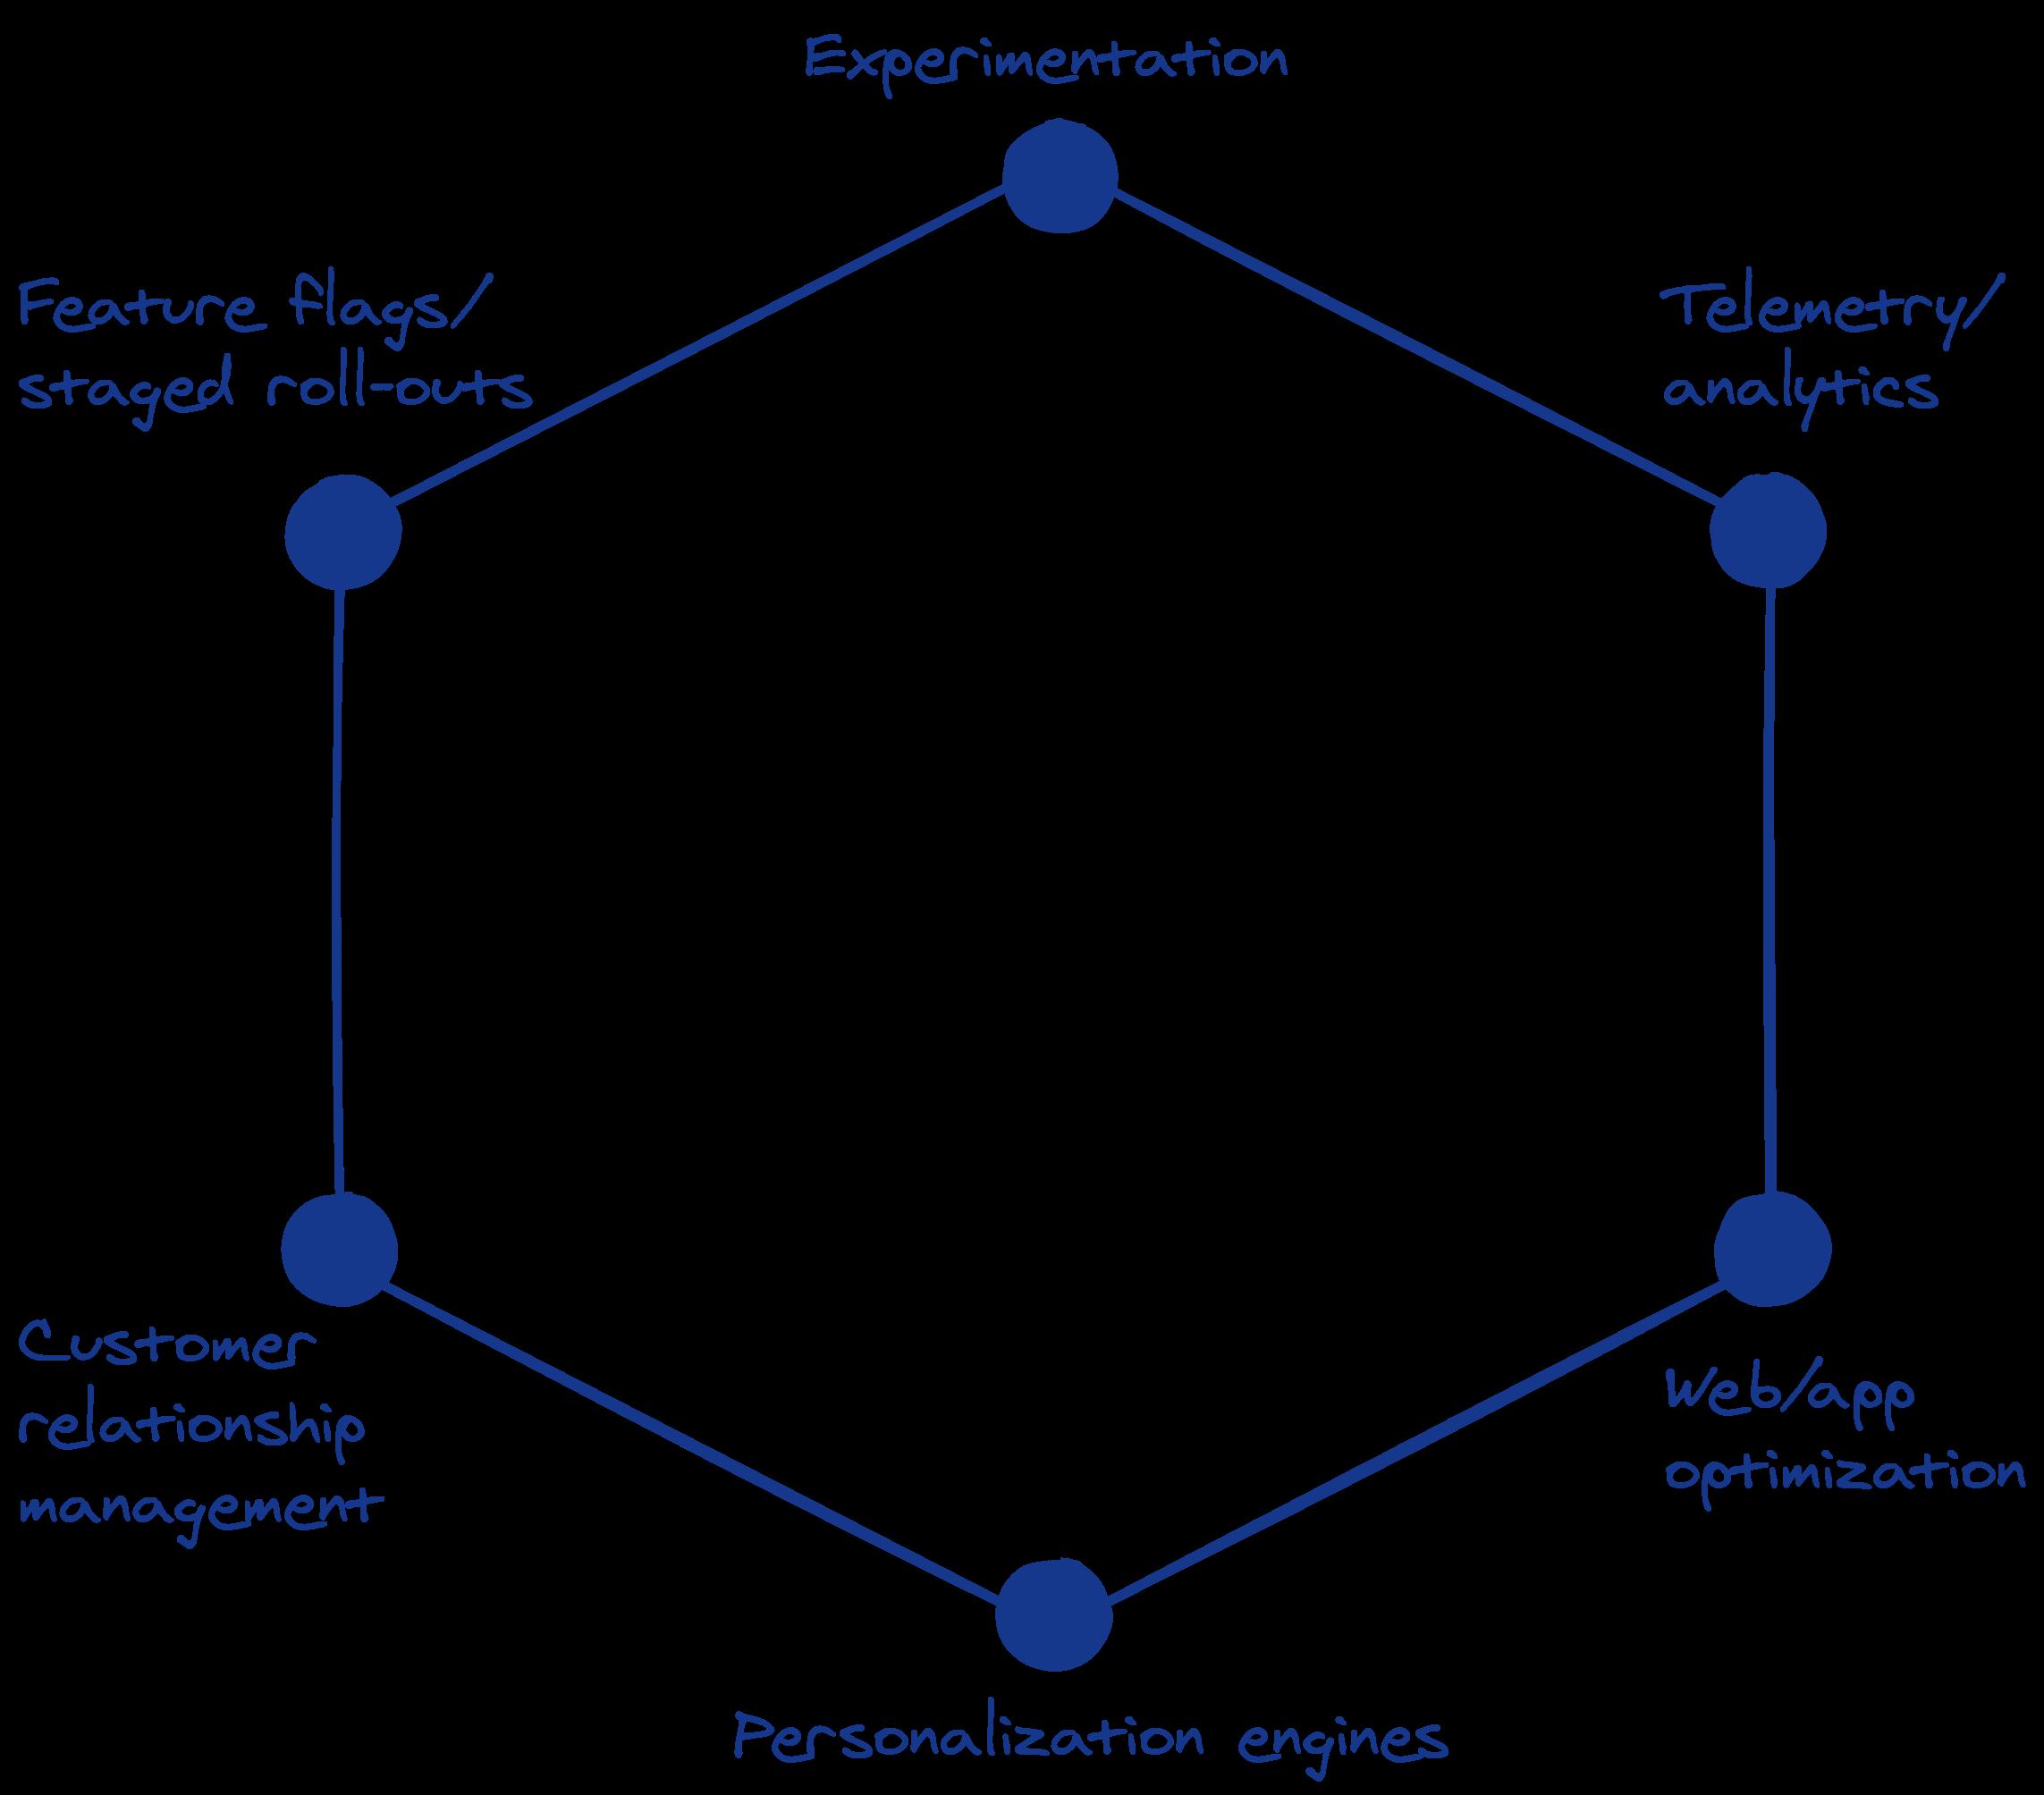 Experiment platform marketplace schematic